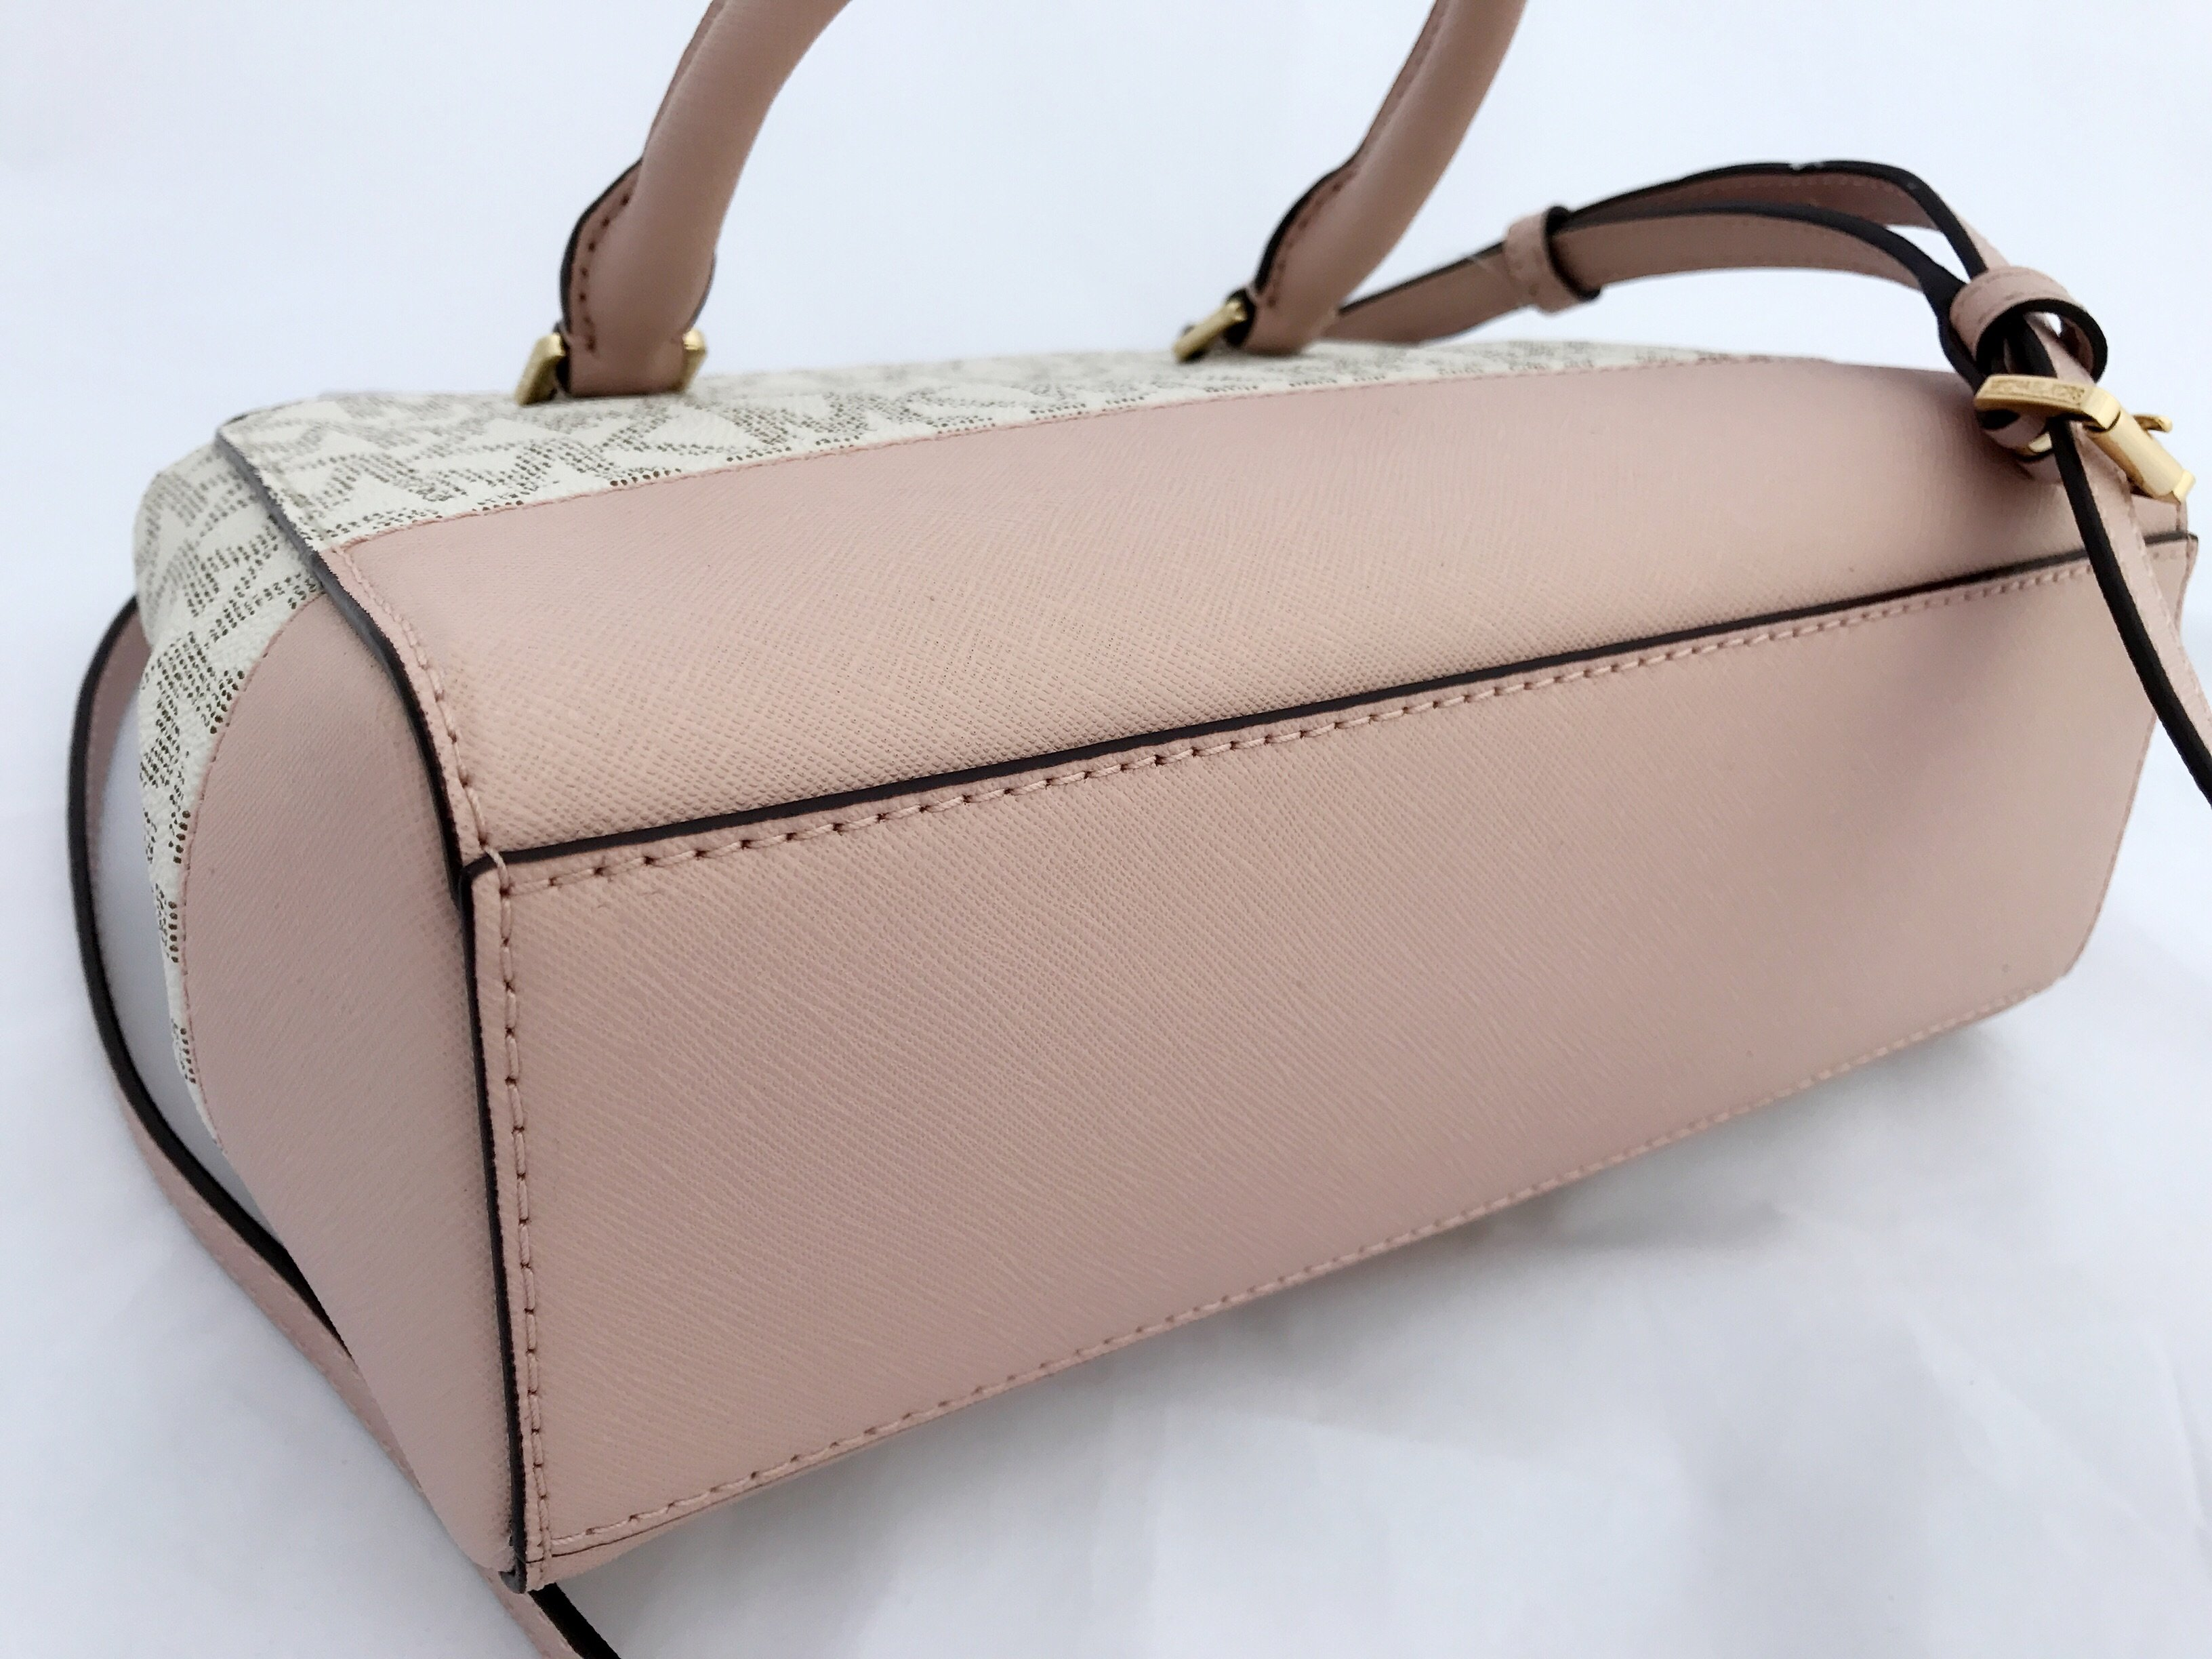 1d7bcba2e5e3 Michael Kors Kellen XS Satchel Vanilla MK Signature Ballet Pink Crossbody  Bag | eBay